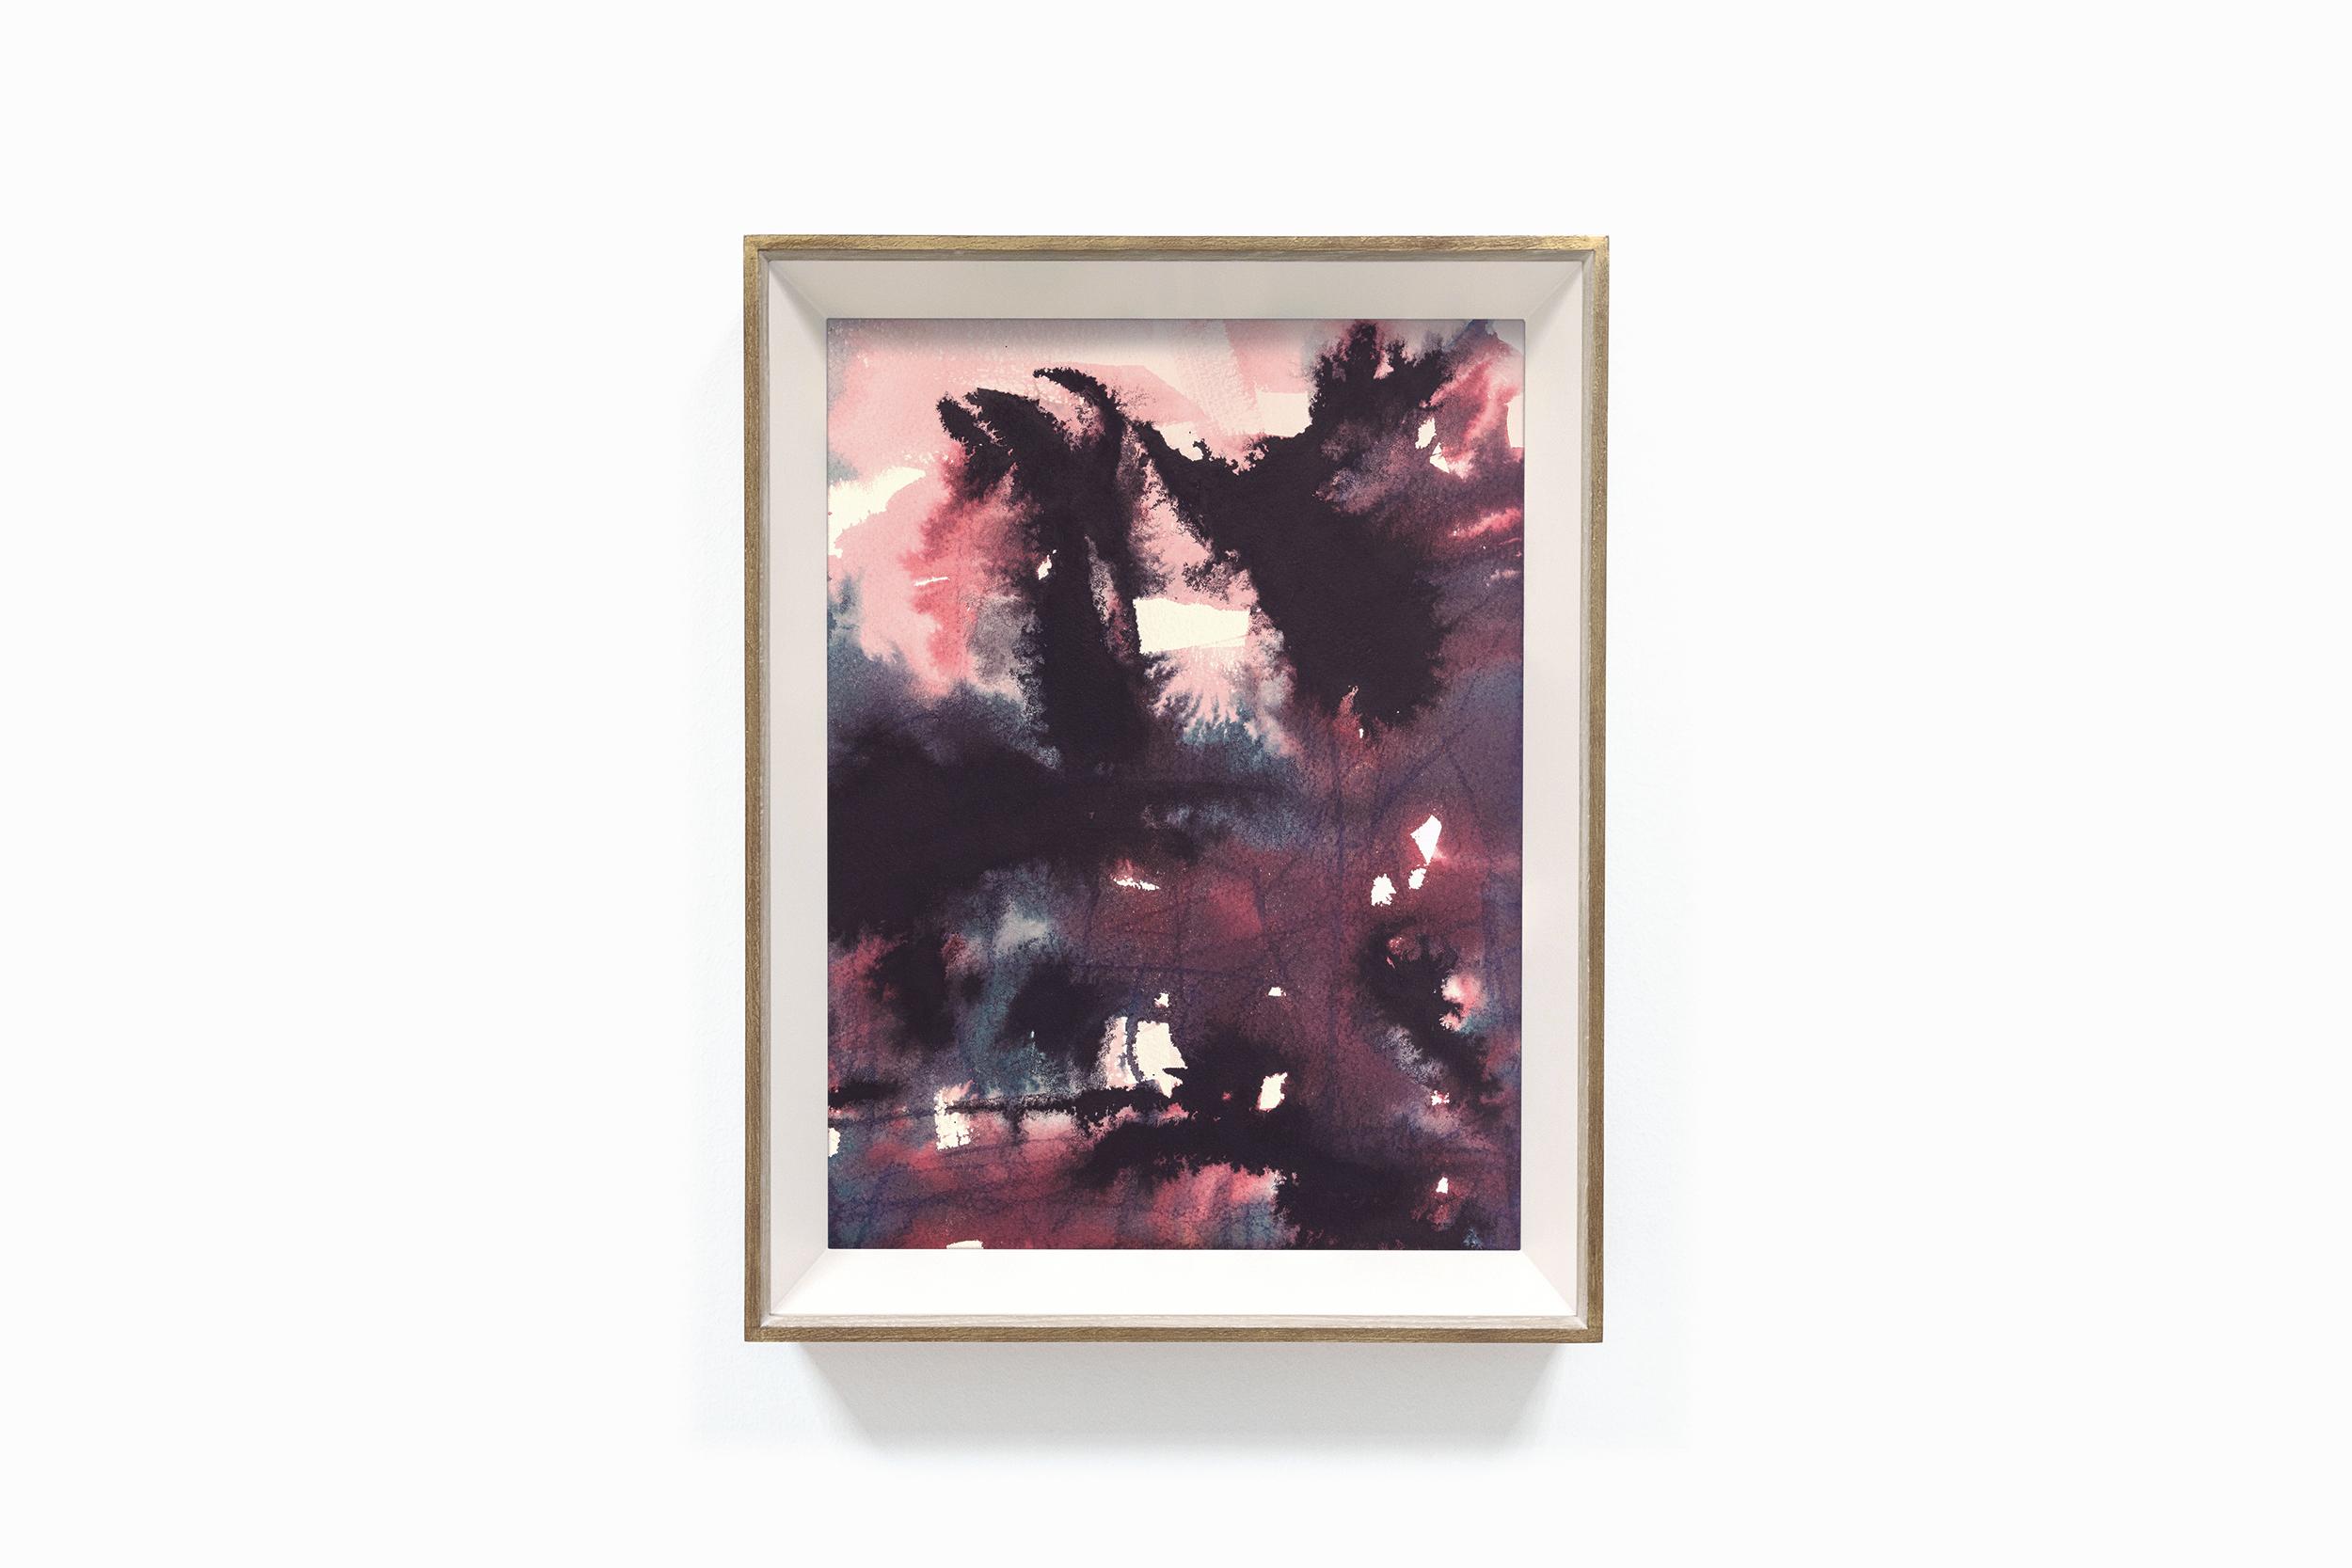 bonjourmolotov Dust Illustration Ilustracao painting pintura acrylic acrílico canvas tela paper cardboard mdf Andre Gigante 07N2.jpg